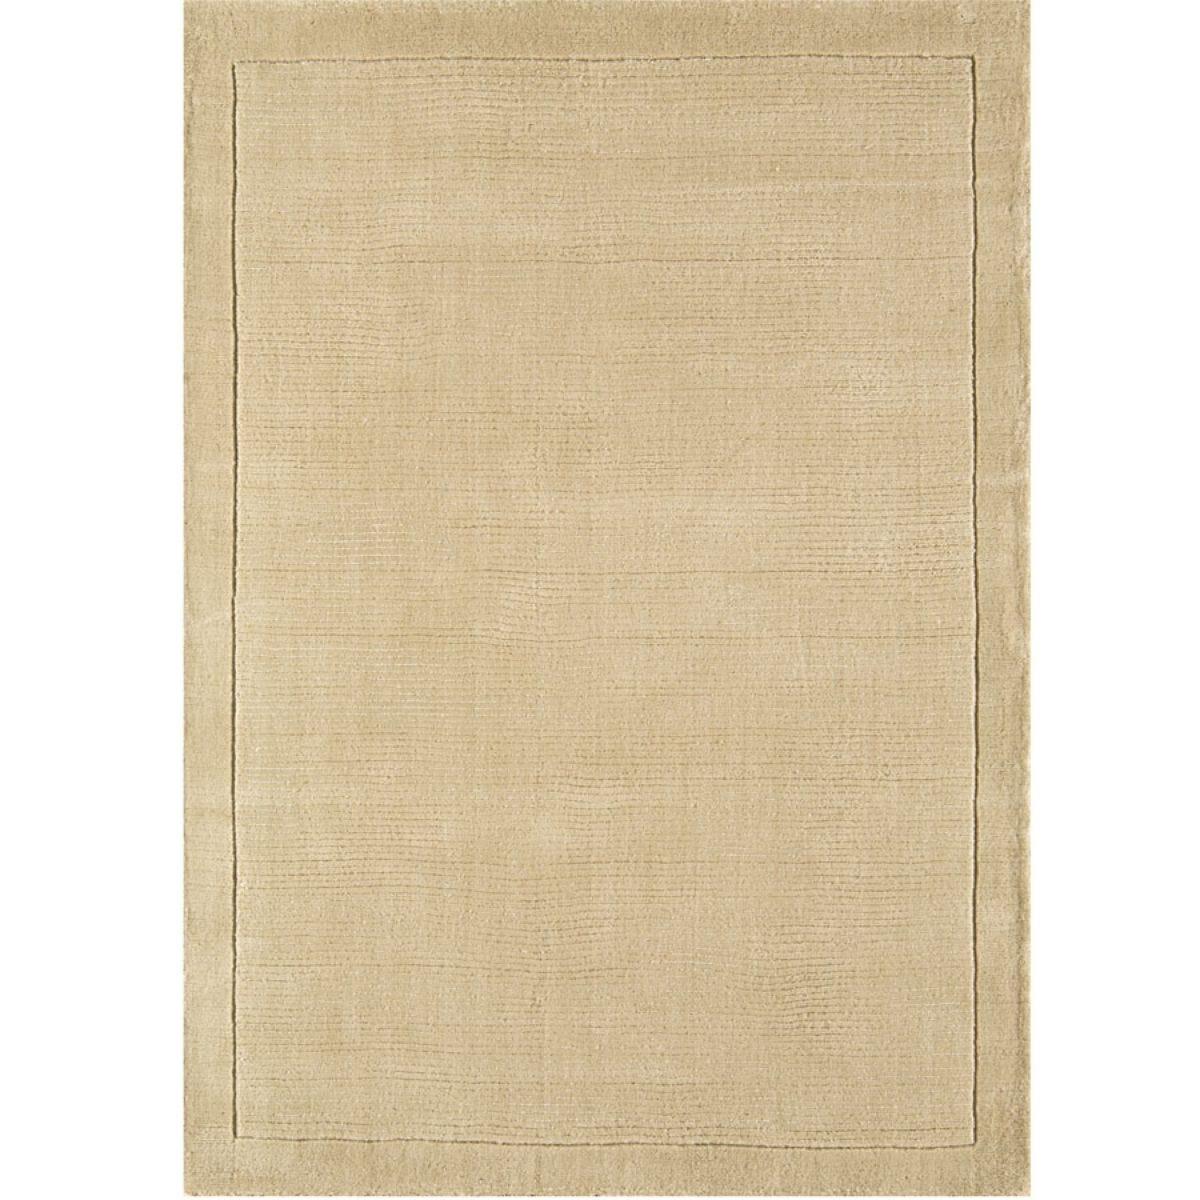 Asiatic York Rug, 200 x 290cm - Beige